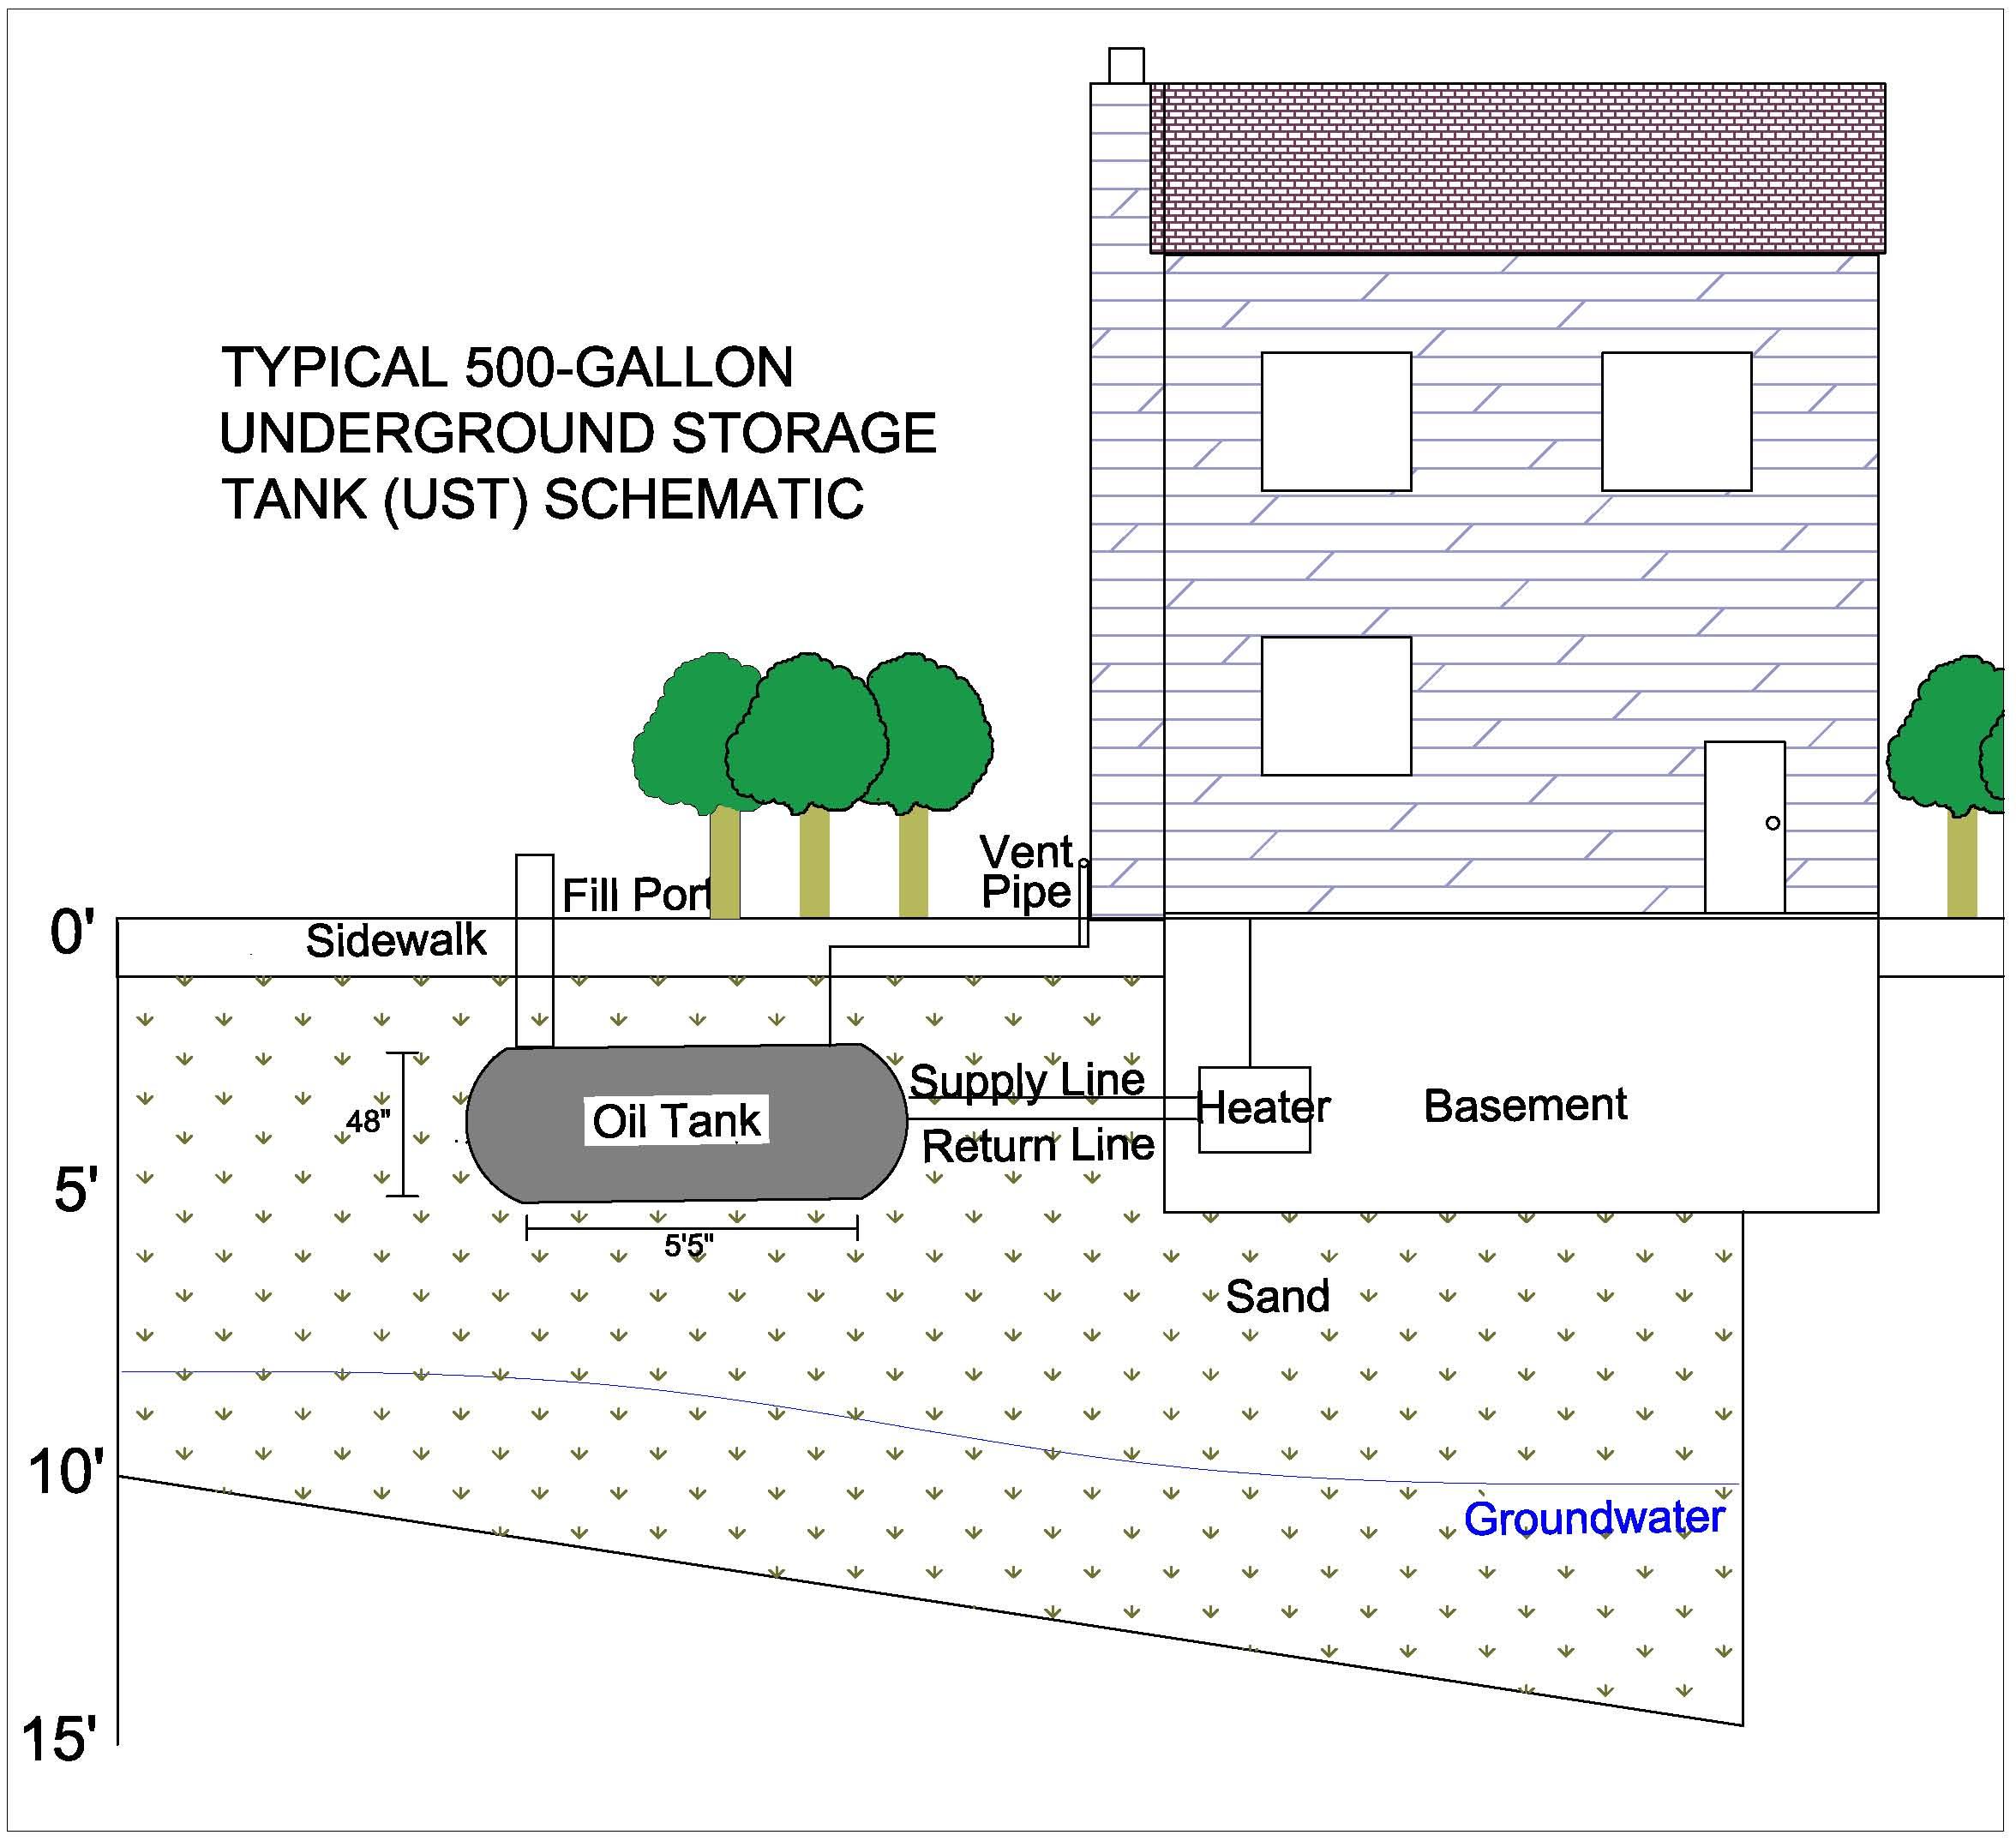 Tank diagram pdf find wiring diagram how do you remediate a leaking oil tank aka oil tank cleanup rh currenenvironmental com lennox wiring diagram pdf diagrams for macroeconomics pdf ccuart Choice Image